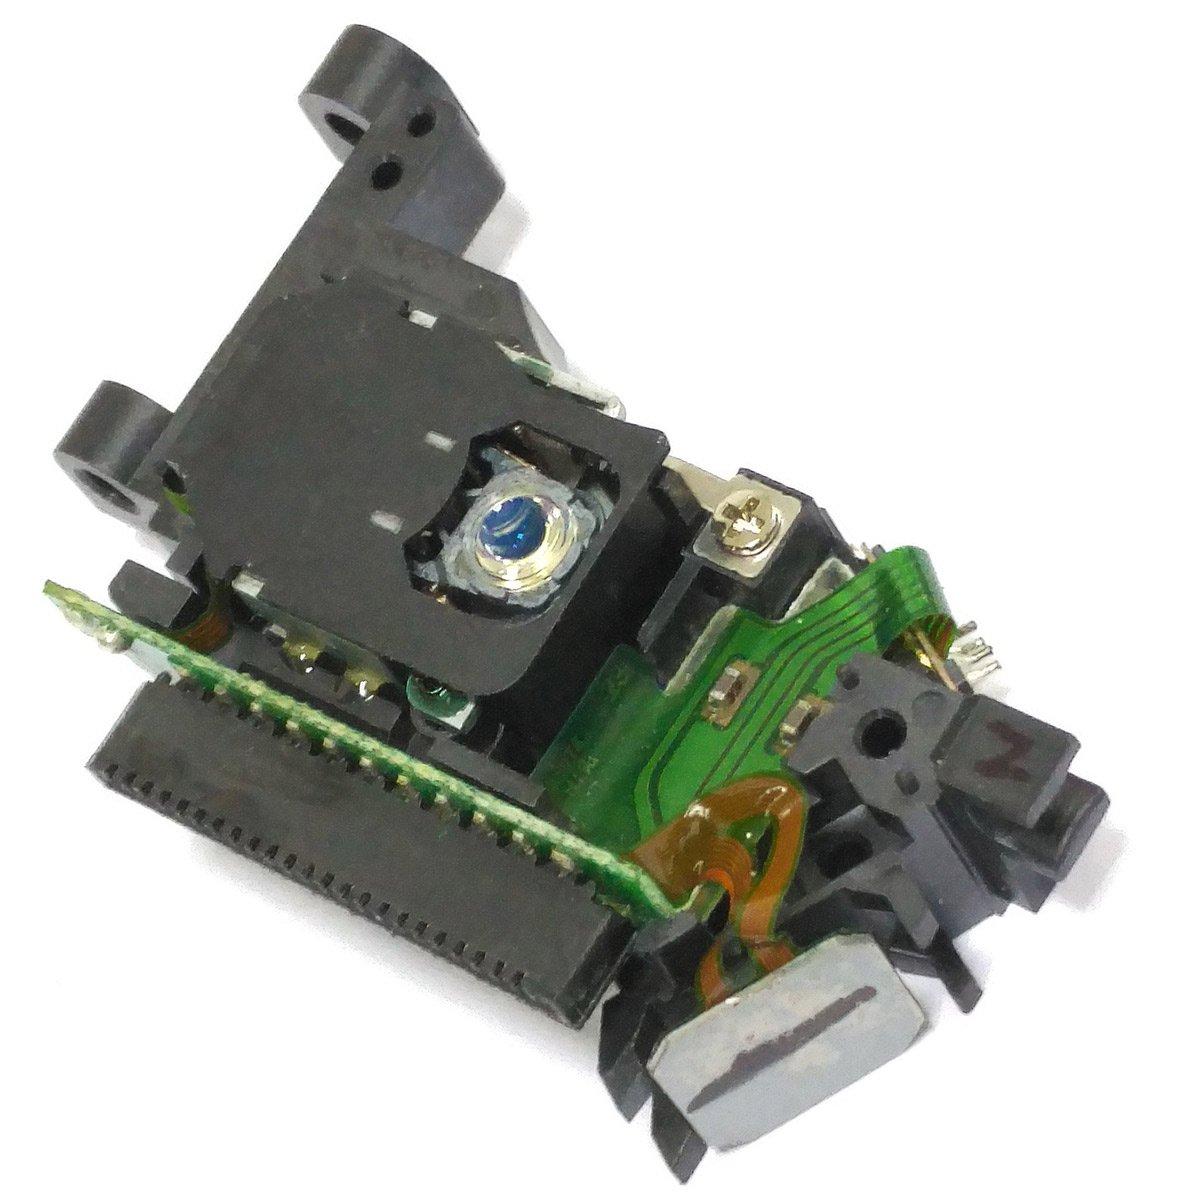 Original SACD Optical Pickup for AUDIO AERO La Source SACD Laser Lens